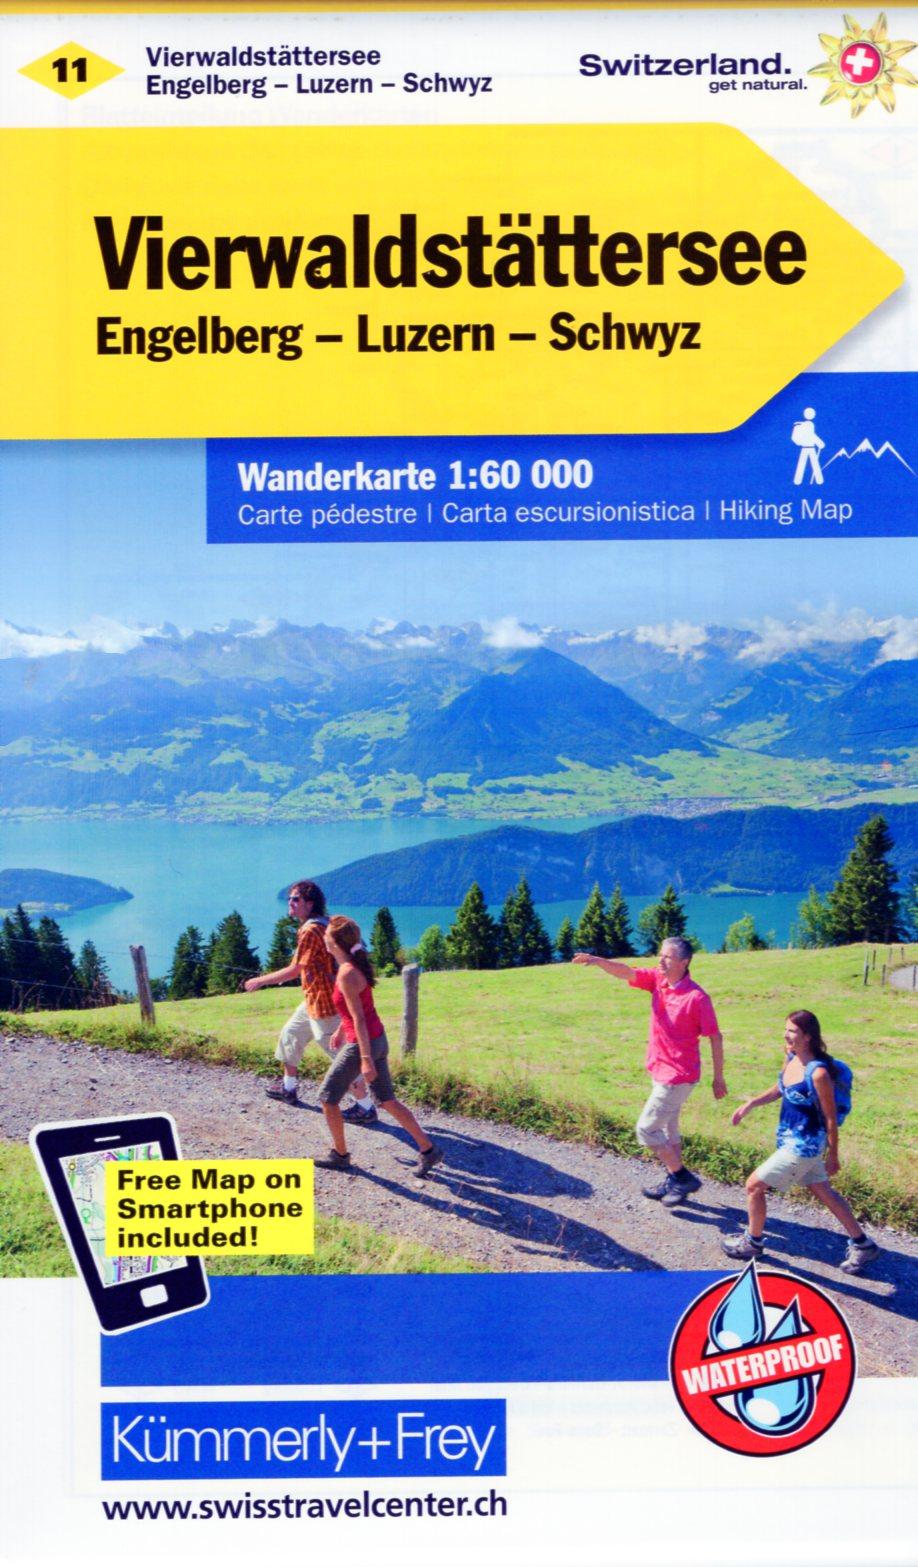 KFW-11  Vierwaldstättersee | wandelkaart / overzichtskaart 9783259022115  Kümmerly & Frey Wandelkaarten Zwitserland  Wandelkaarten Midden- en Oost-Zwitserland